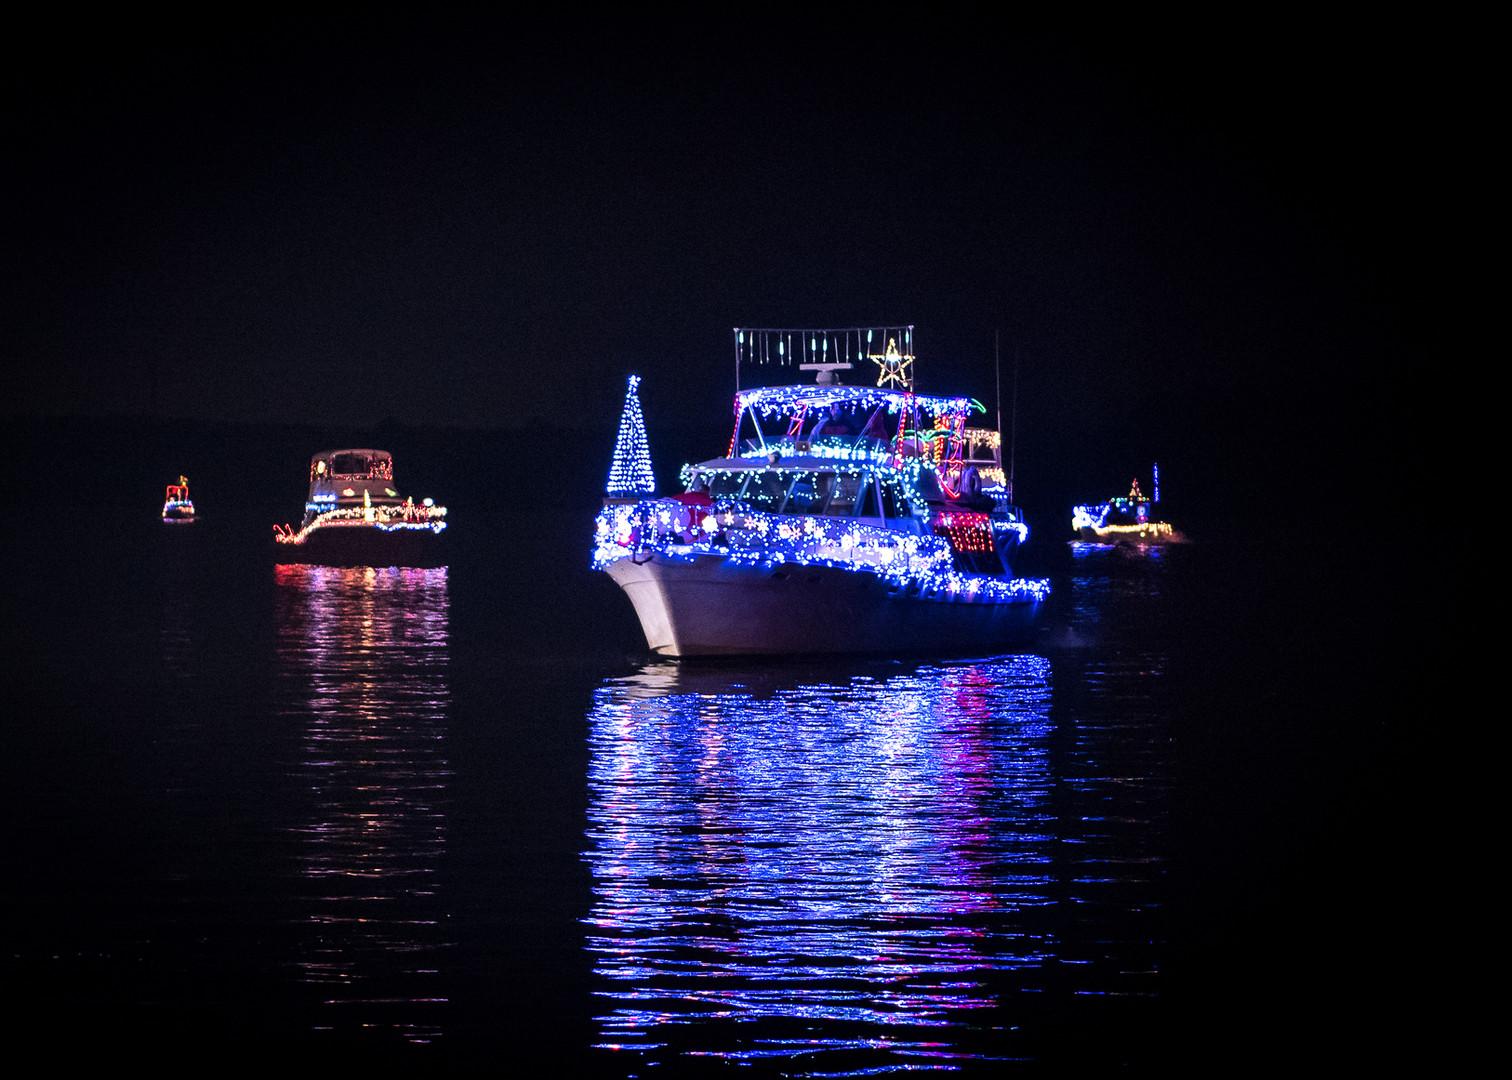 2017 - Hopewell Holiday Boat Parade - Hi